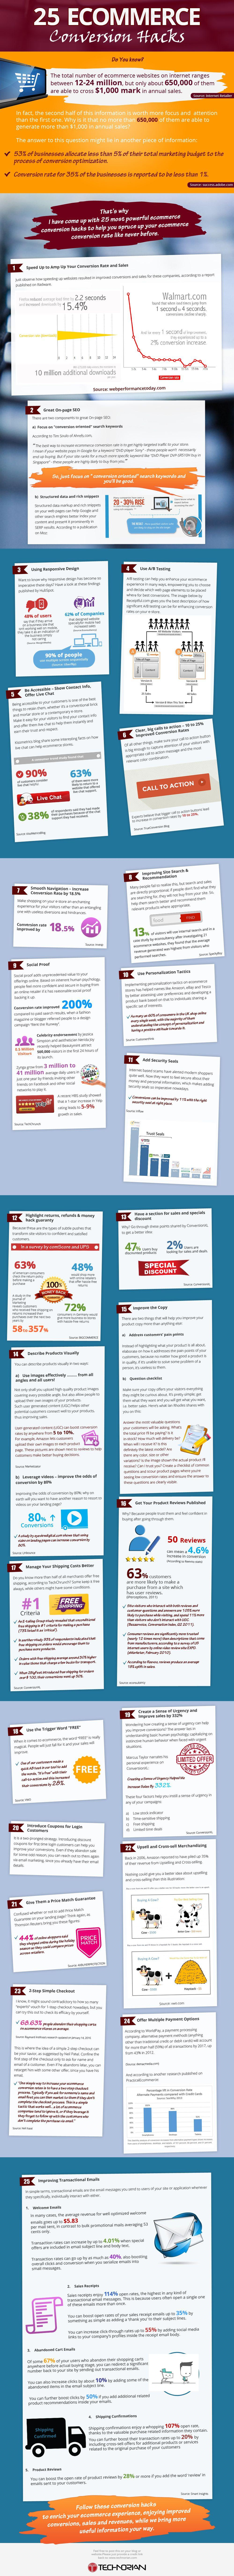 ccf9c78d5cb3 25 Ways to Improve Your Online Sales Process  Infographic ...